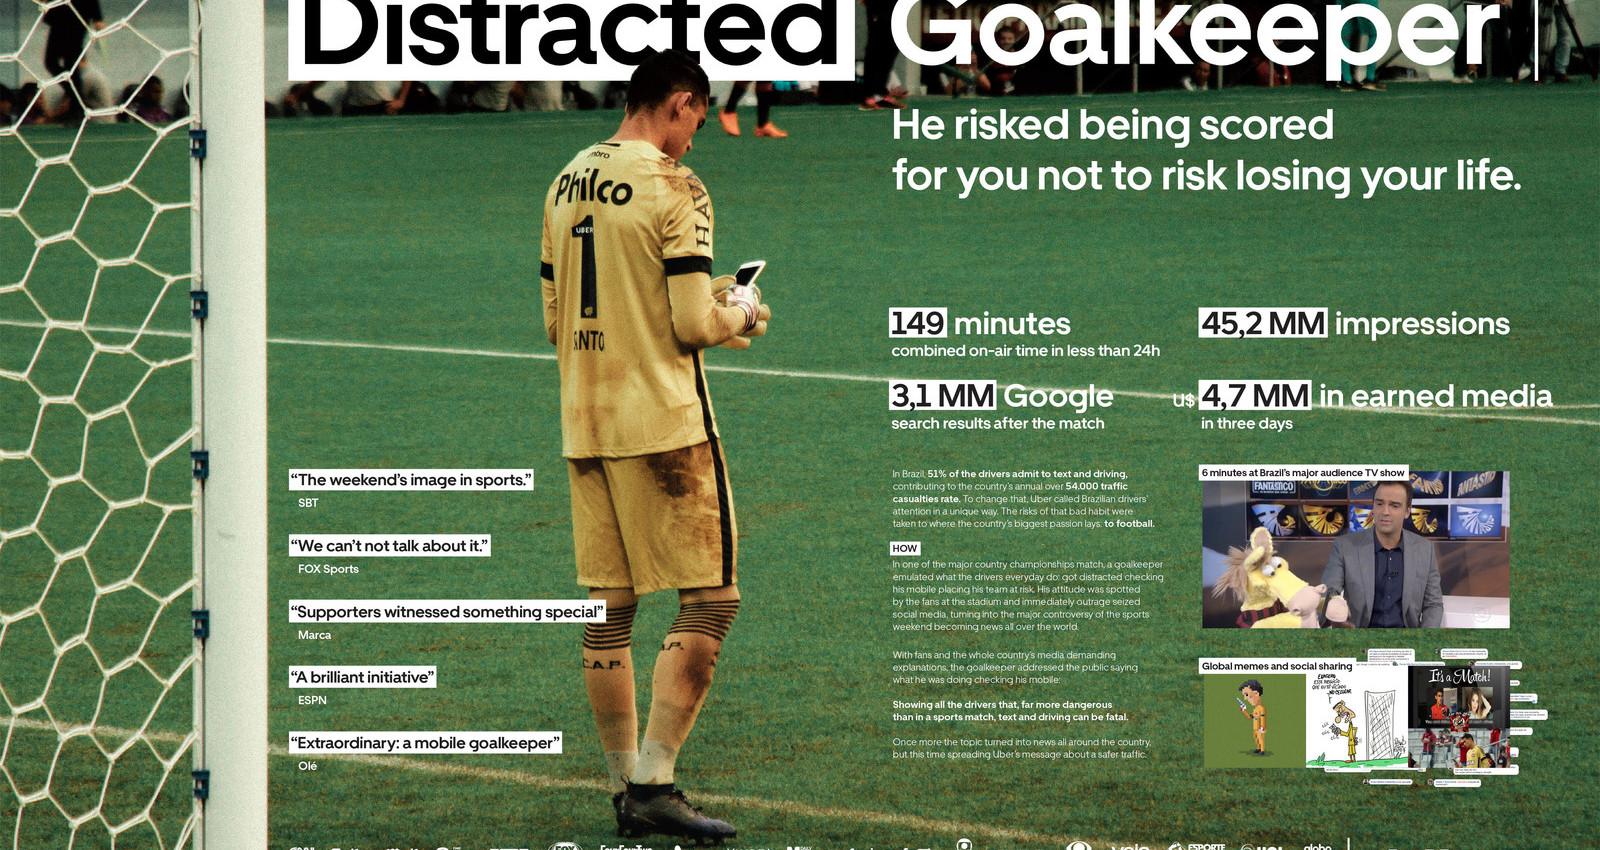 Distracted Goalkepper